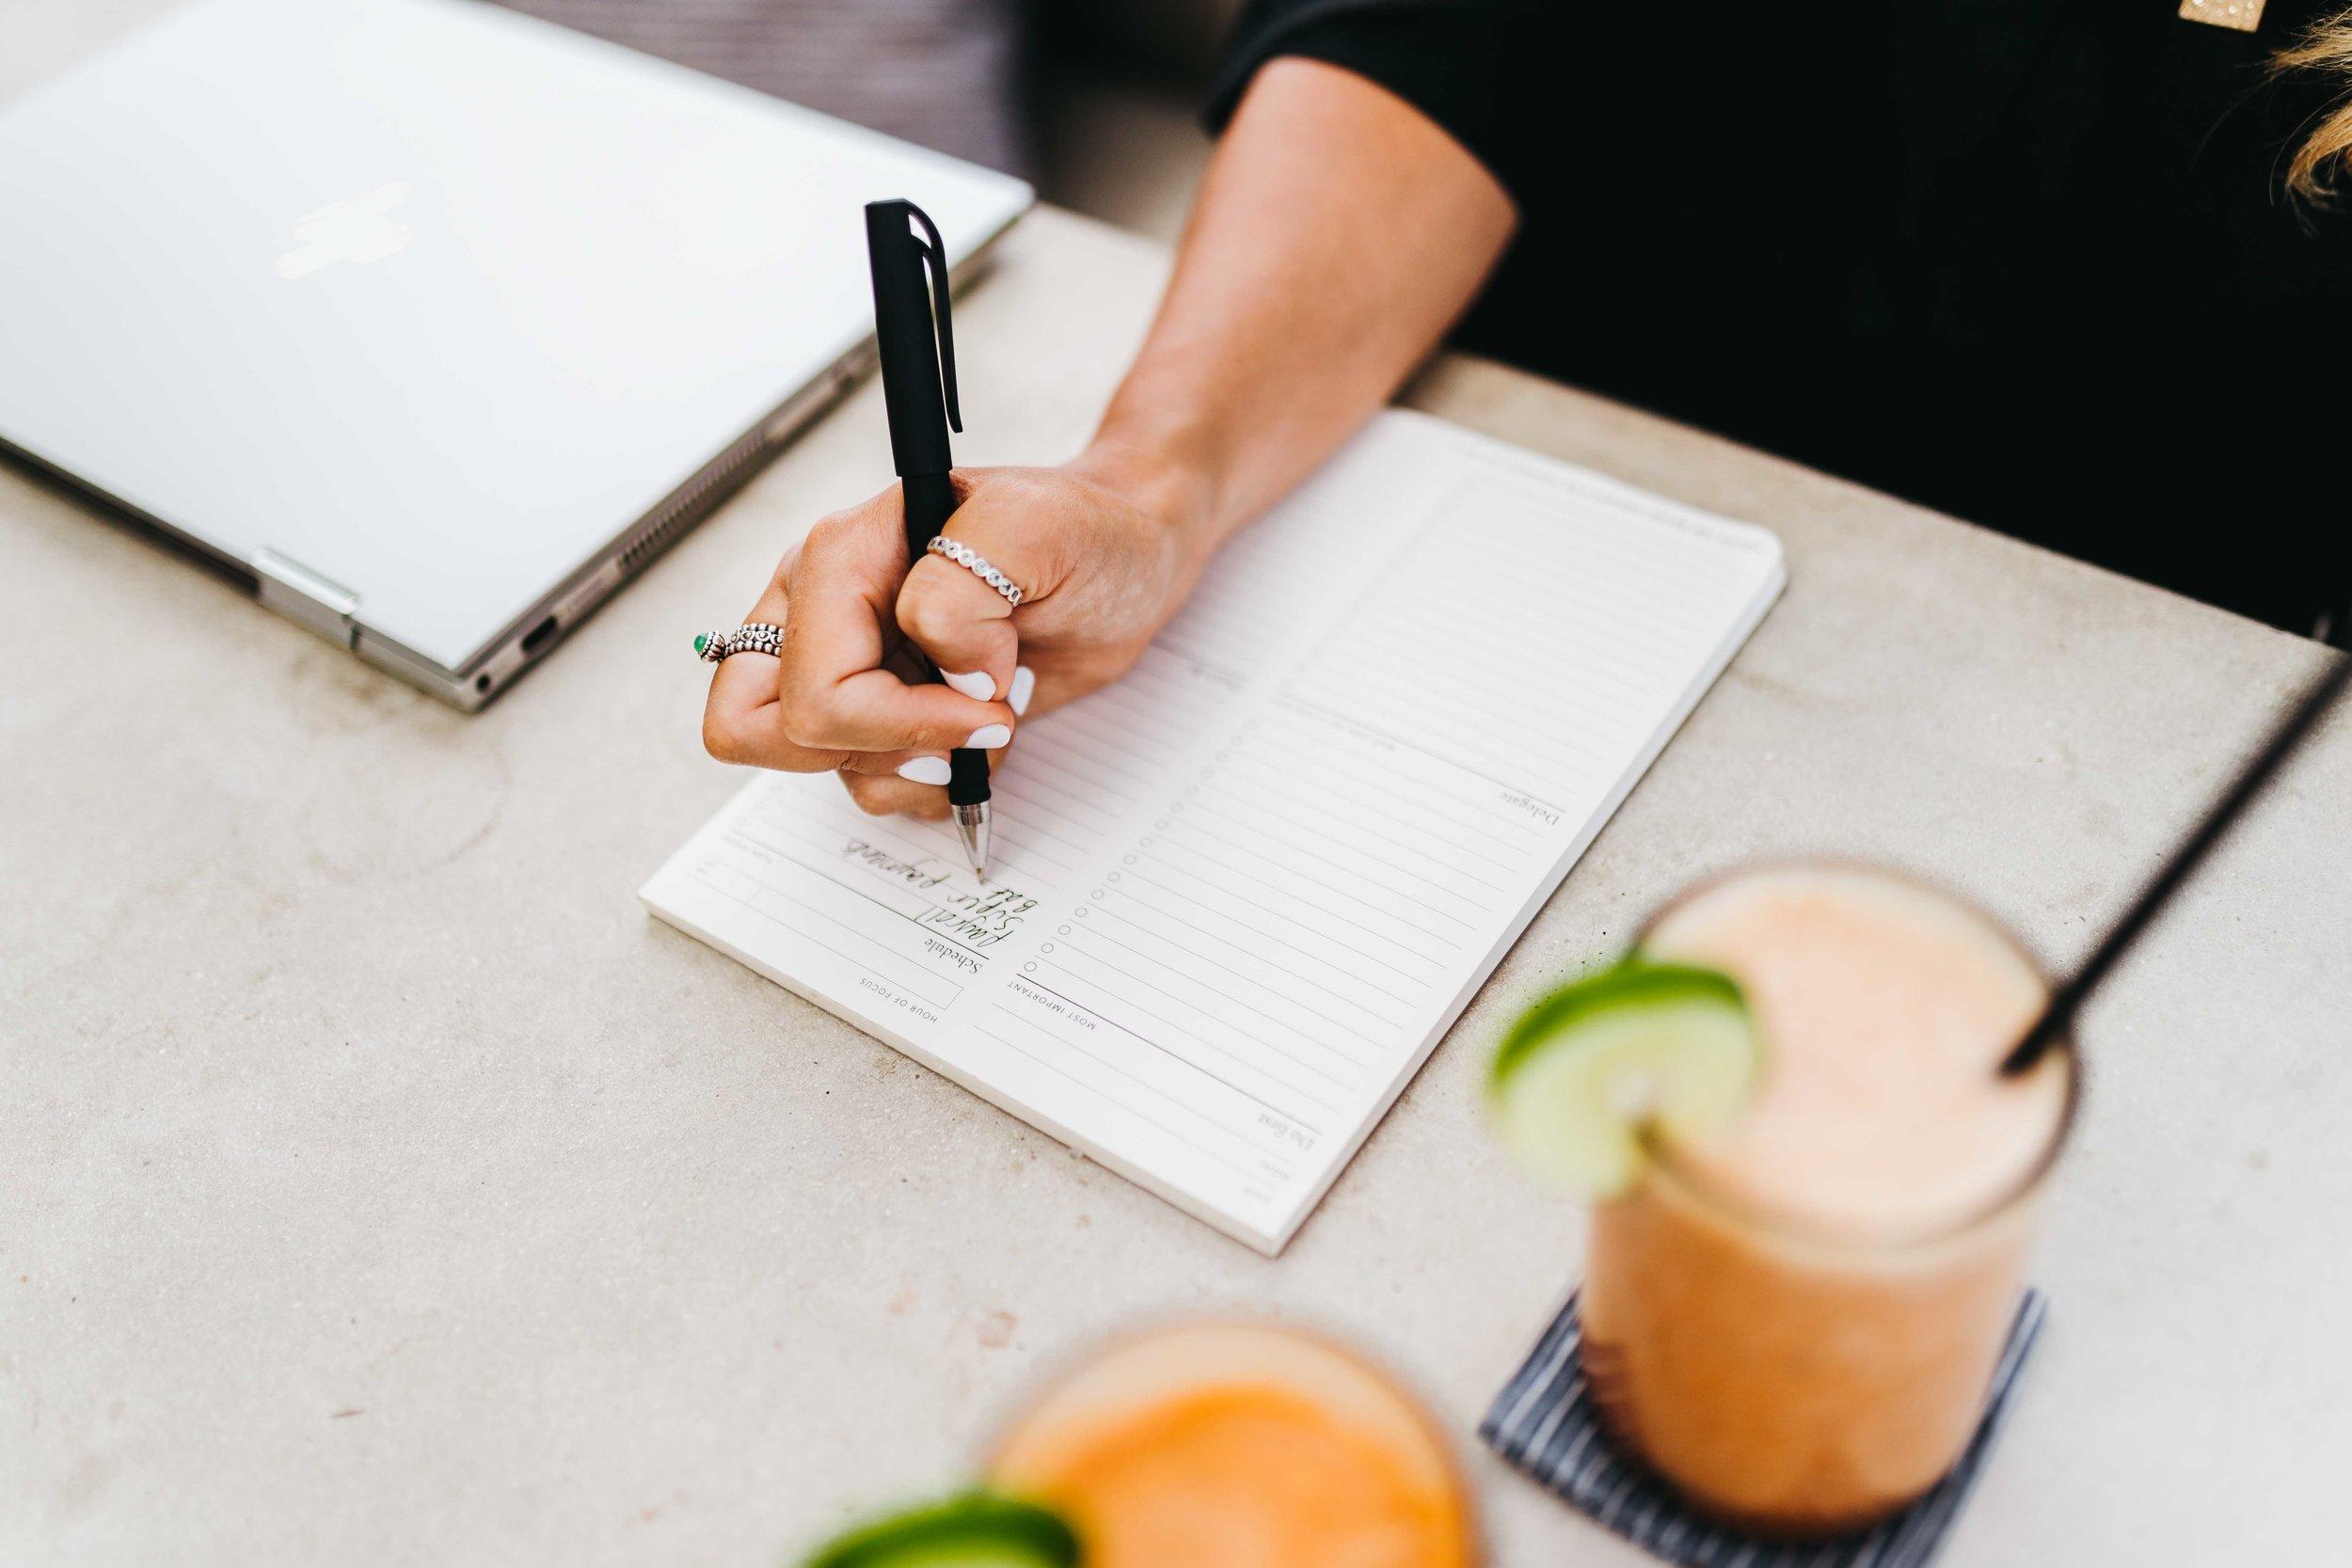 keira-mason-zest-bookkeeping-solutions-writing-down-list.jpg